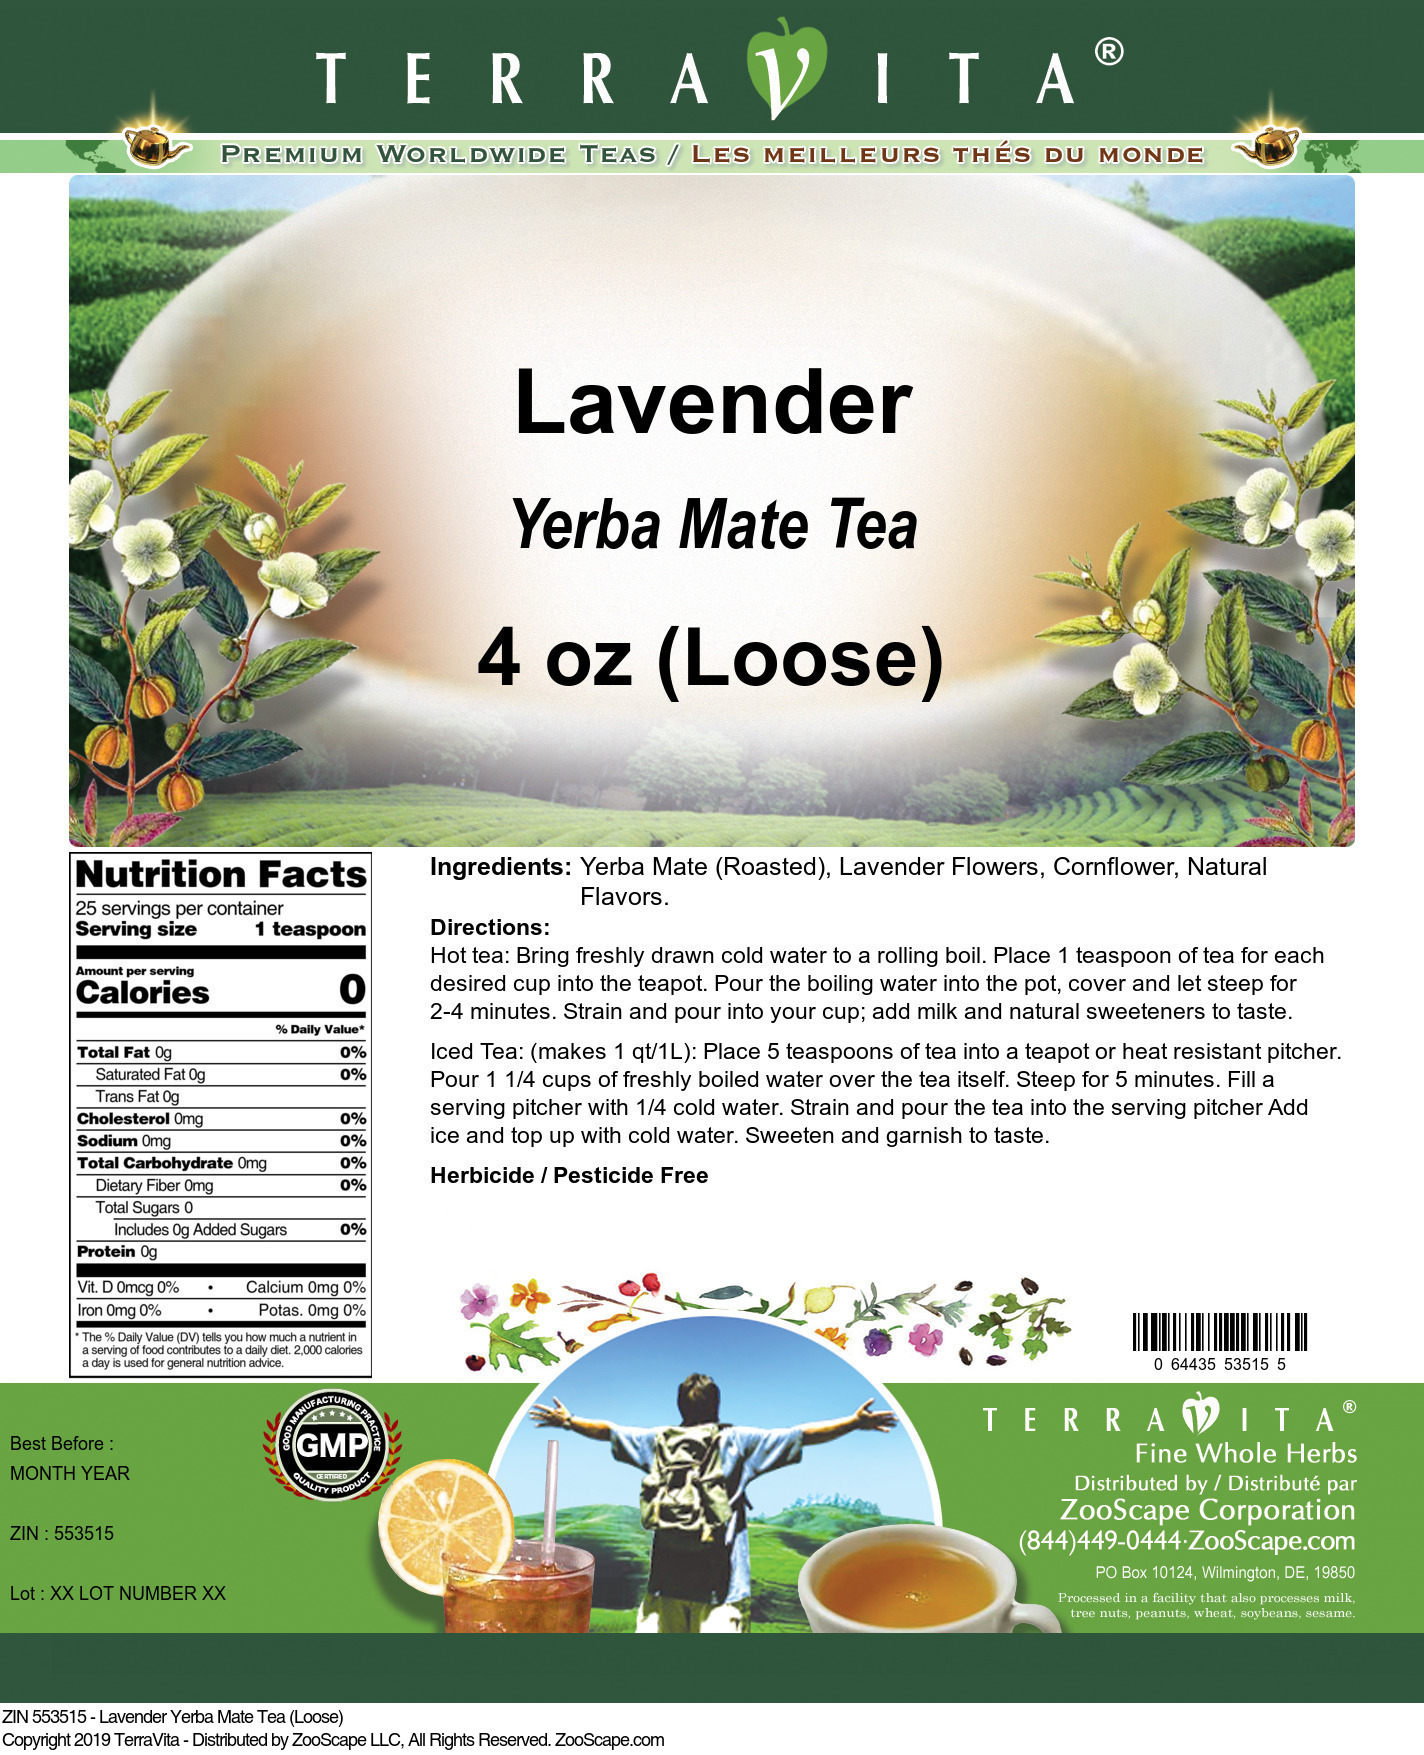 Lavender Yerba Mate Tea (Loose)